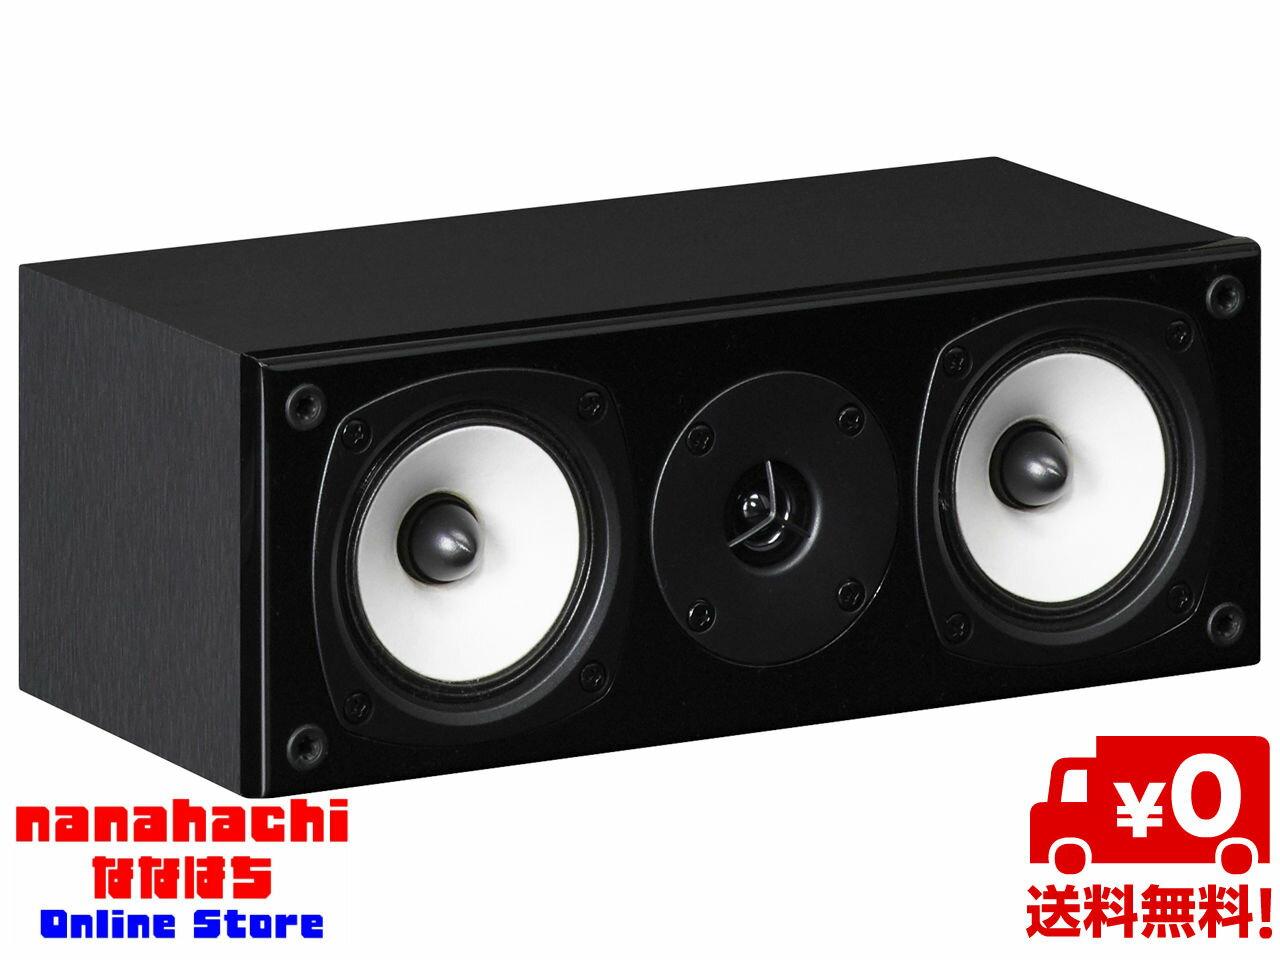 ONKYO D-109XC-B [黒 単品]ホームシアター向けセンタースピーカーシステム オンキョー【送料無料】